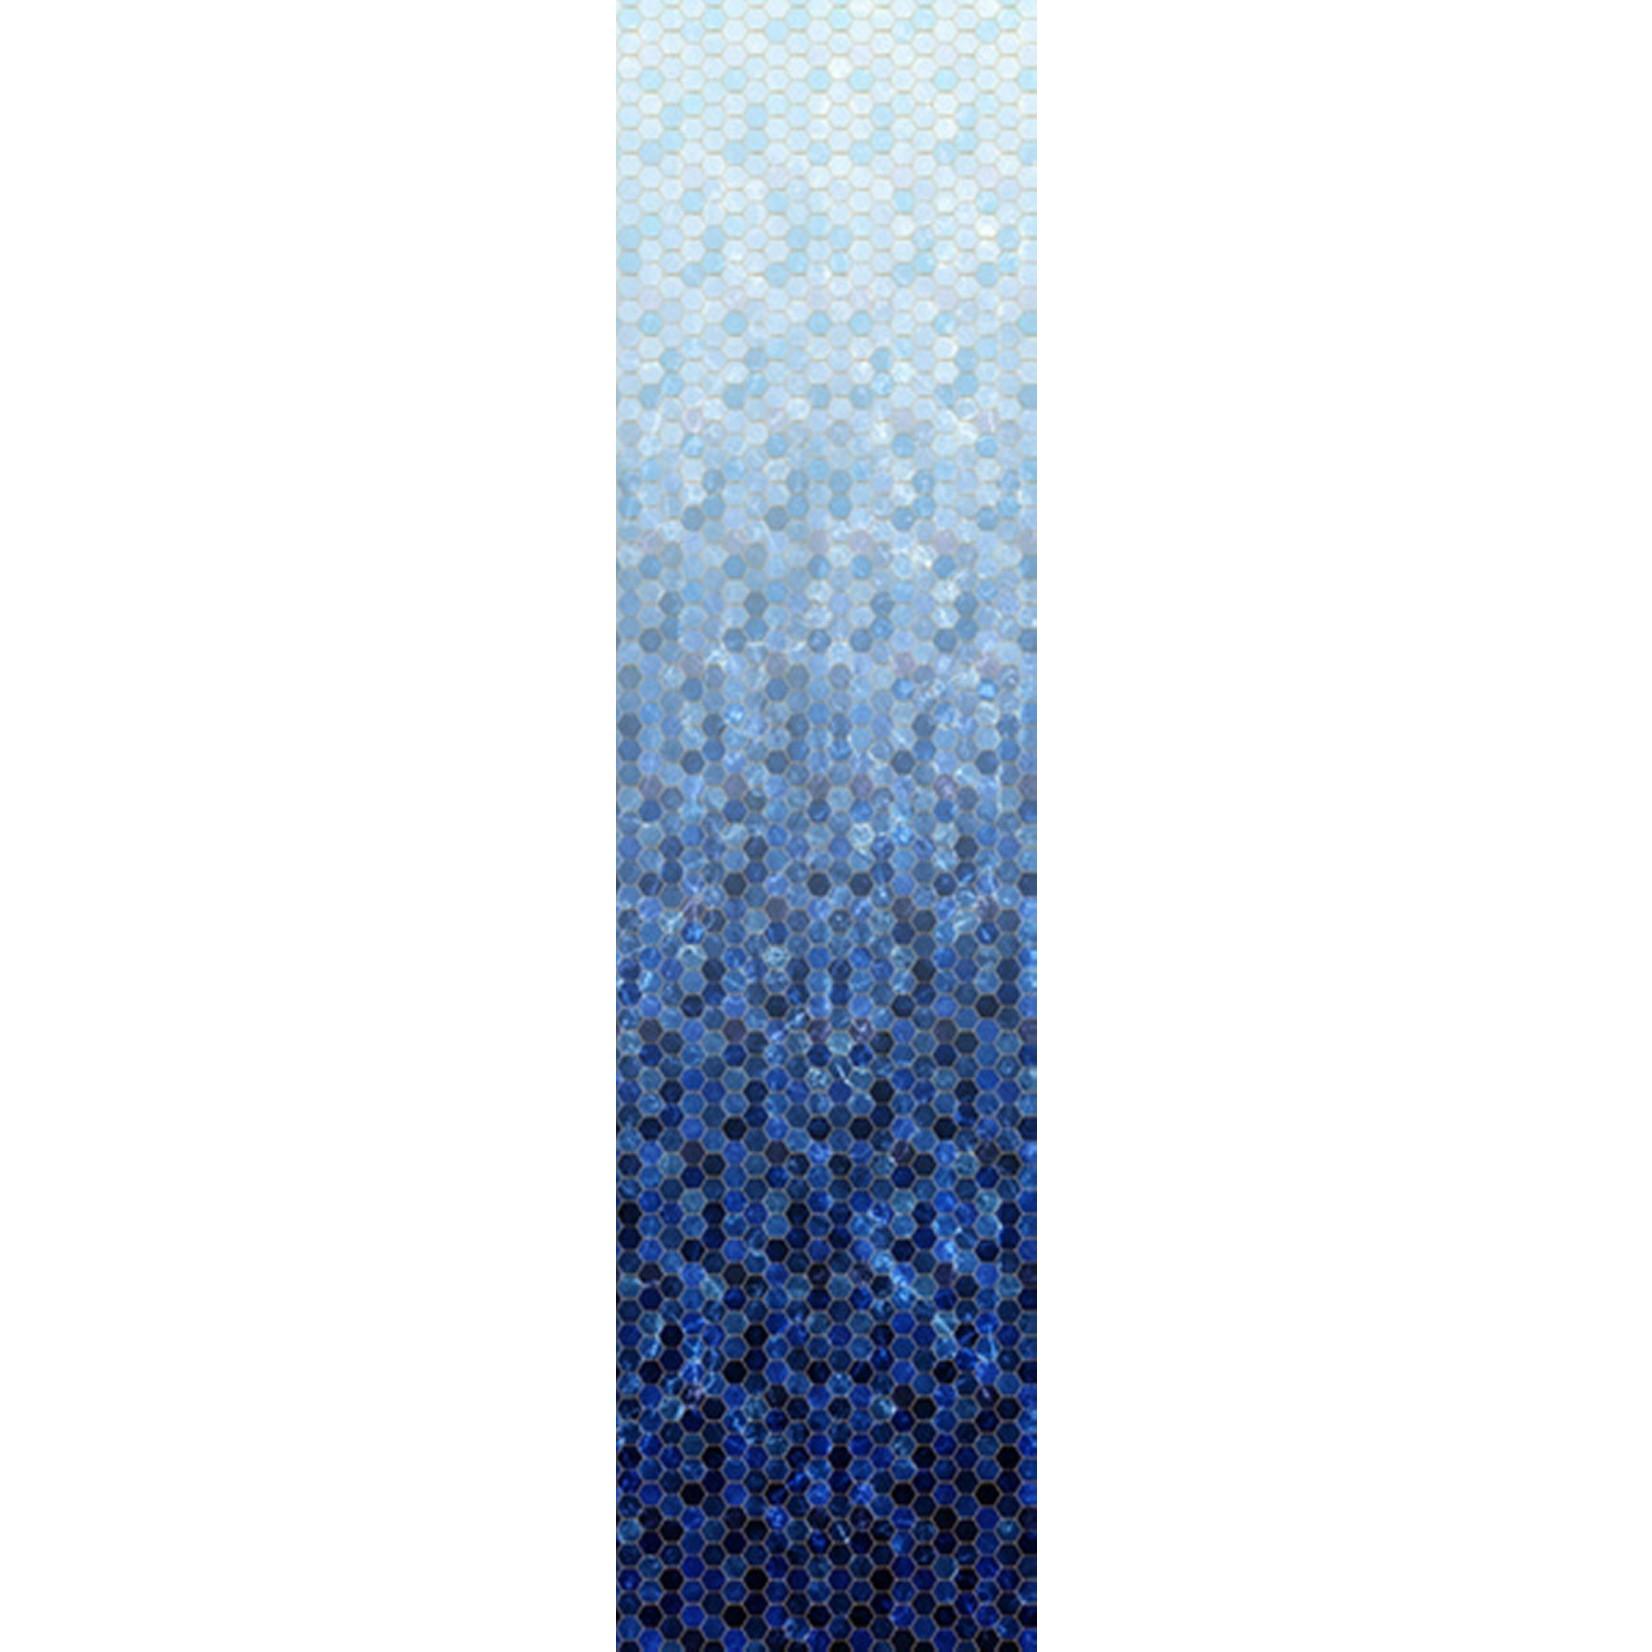 Hoffman Fabrics Backsplash 2.0 - Blue